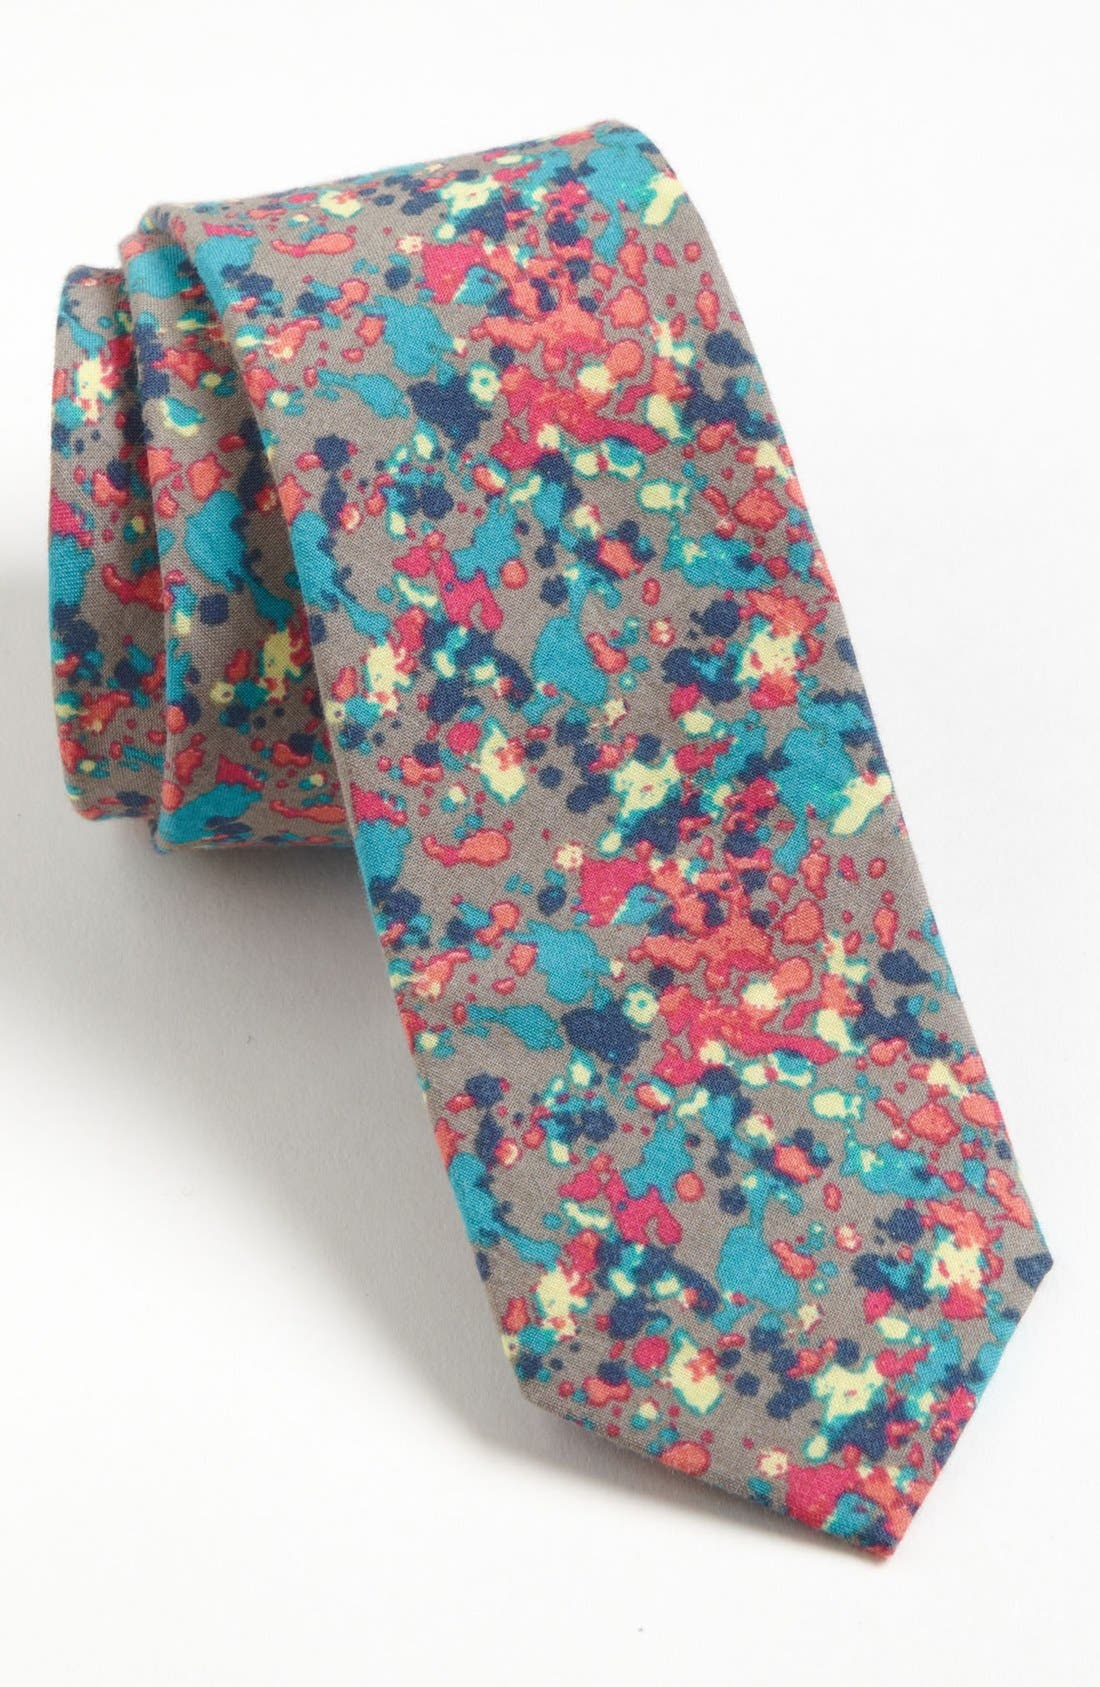 Alternate Image 1 Selected - Topman Paint Splatter Print Woven Cotton Tie